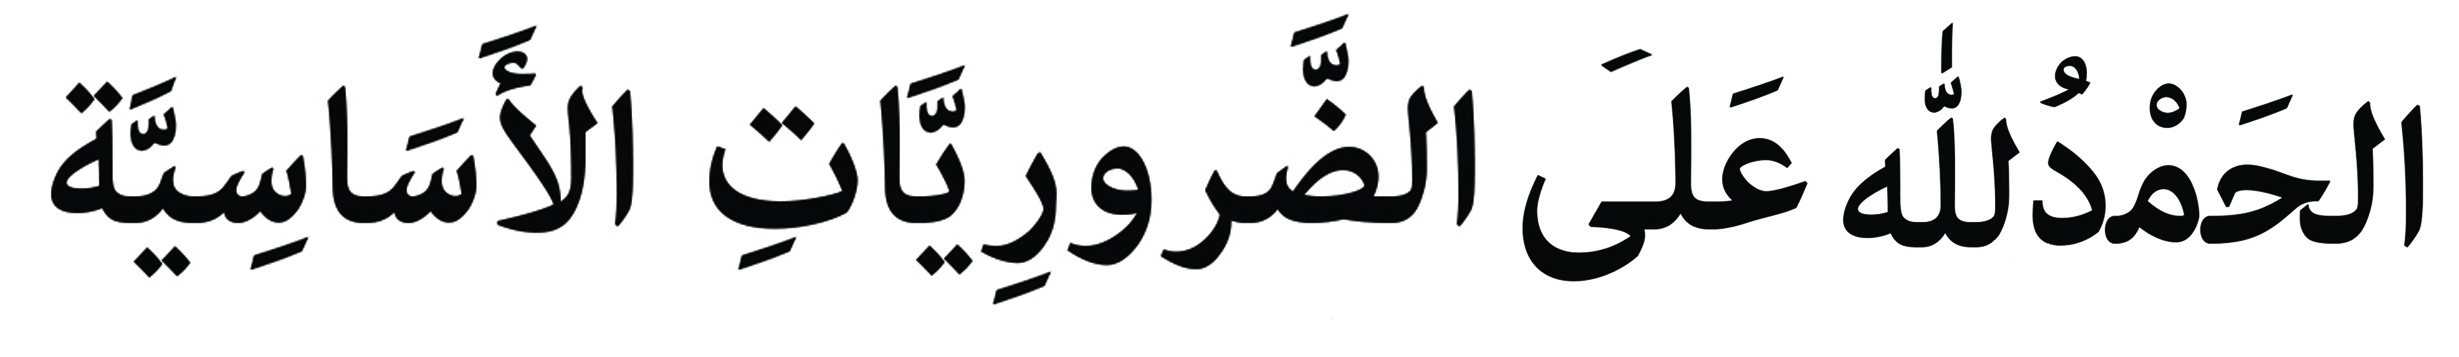 Alhamdulillah ala zarooriyat asaasiyyah - Alhamdulillah for basic necessities - arabic gratitude journal by ayeina